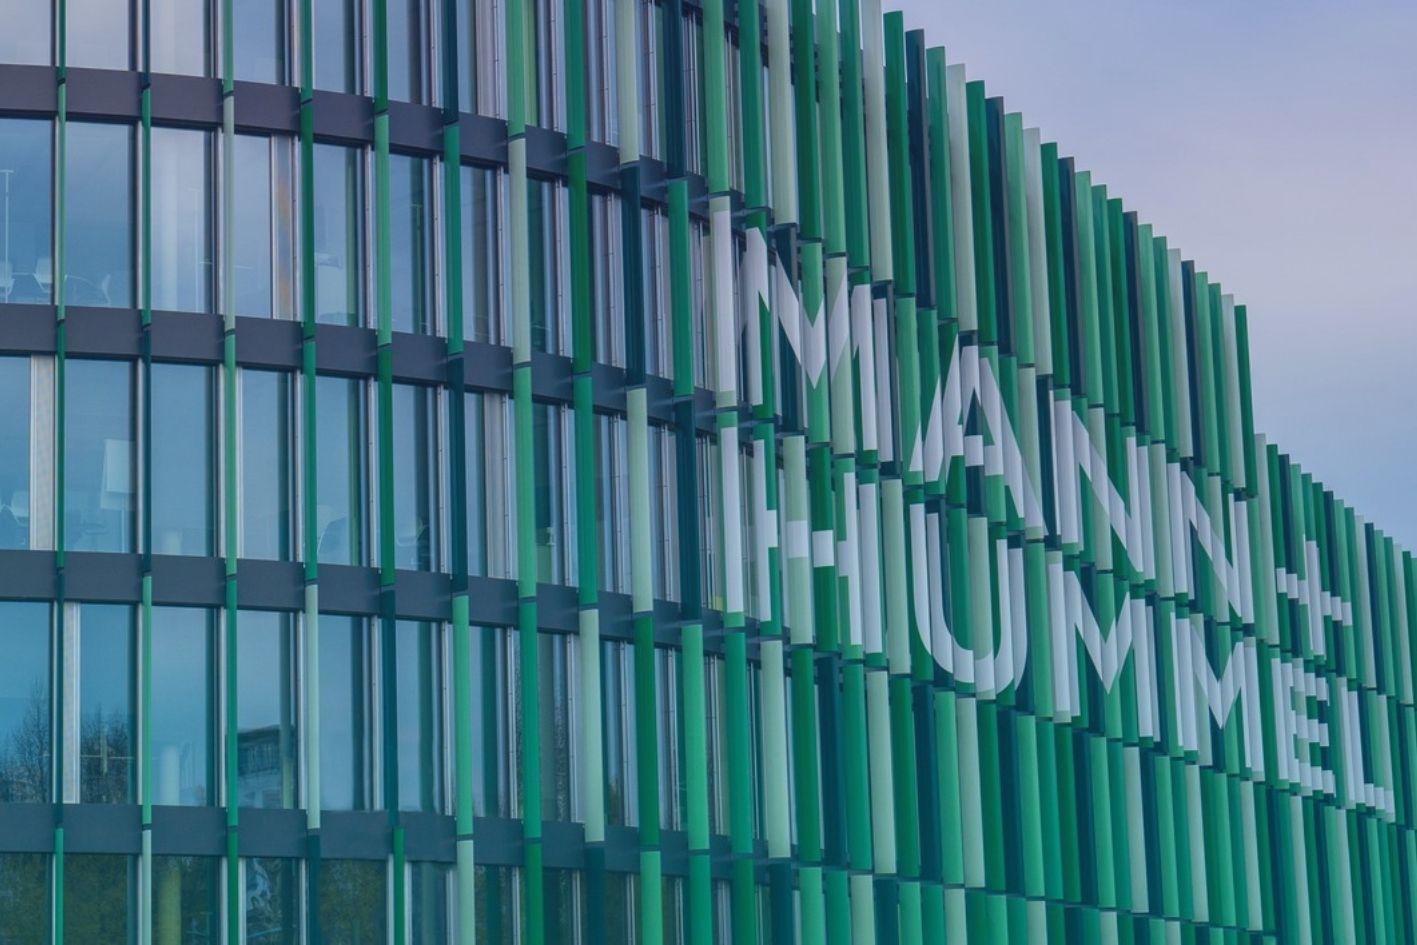 Mann+Hummel-TItelbild